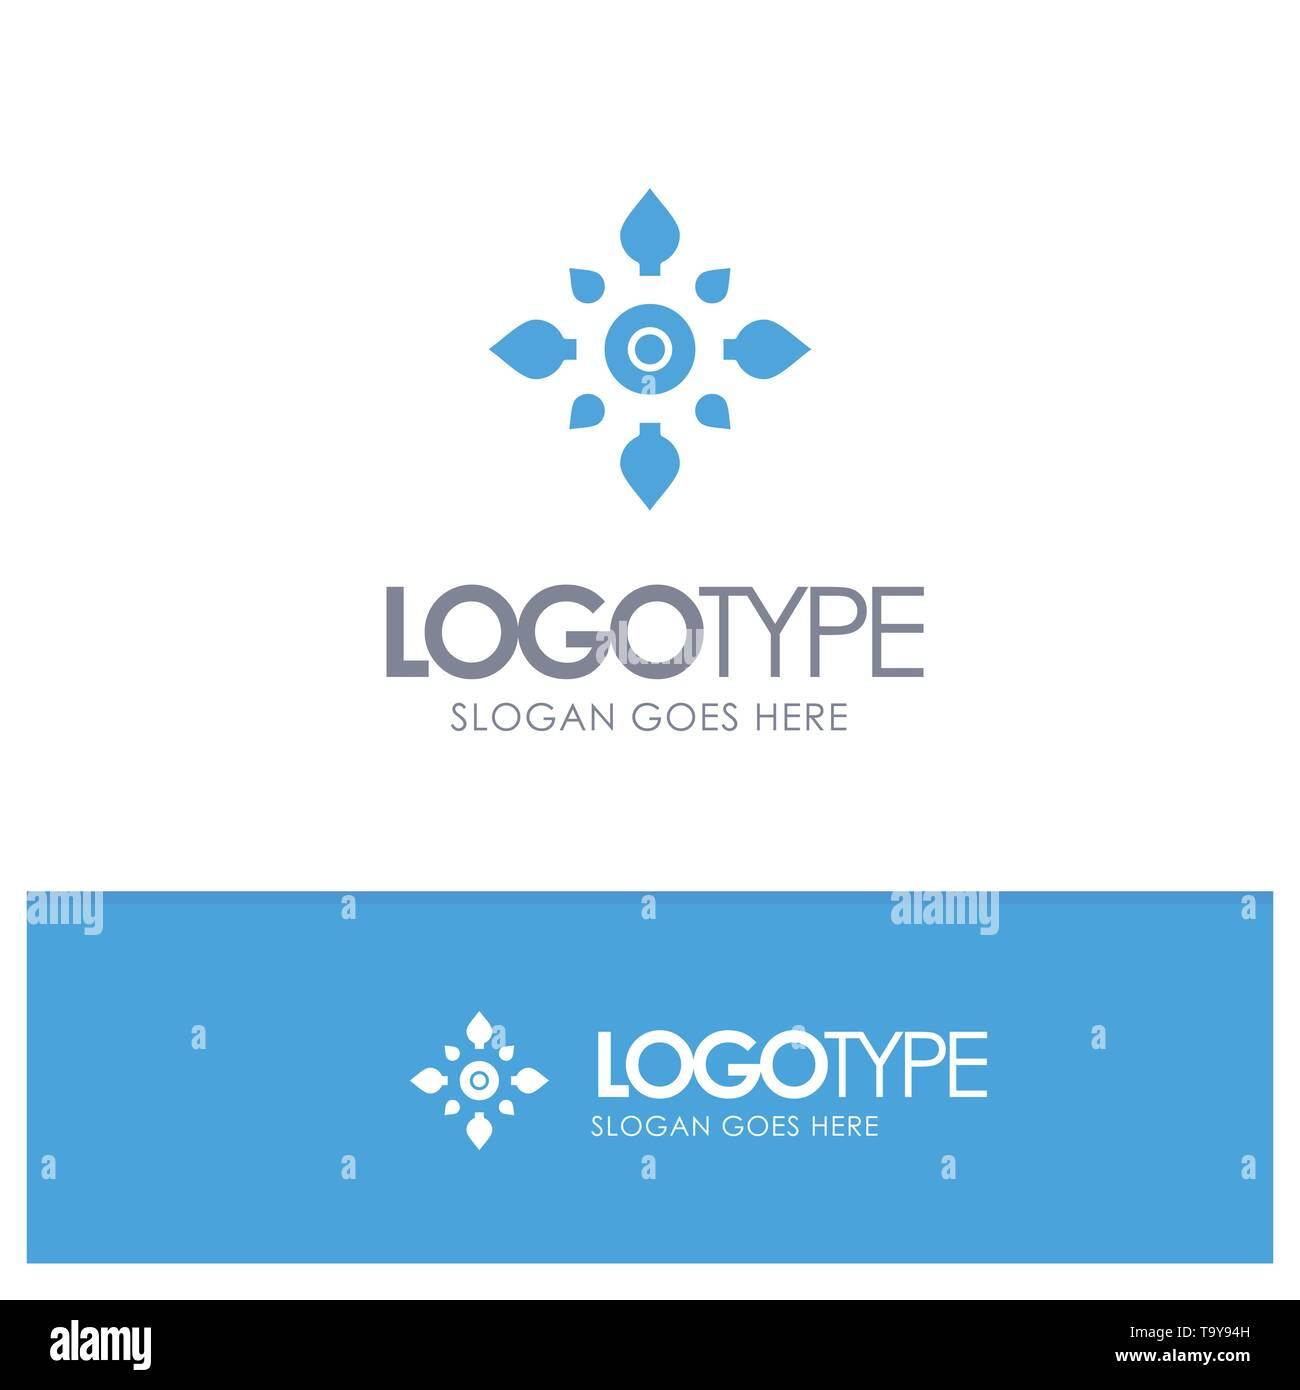 Celebrate, Decorate, Decoration, Diwali, Hindu, Holi Blue Solid Logo with place for tagline - Stock Image